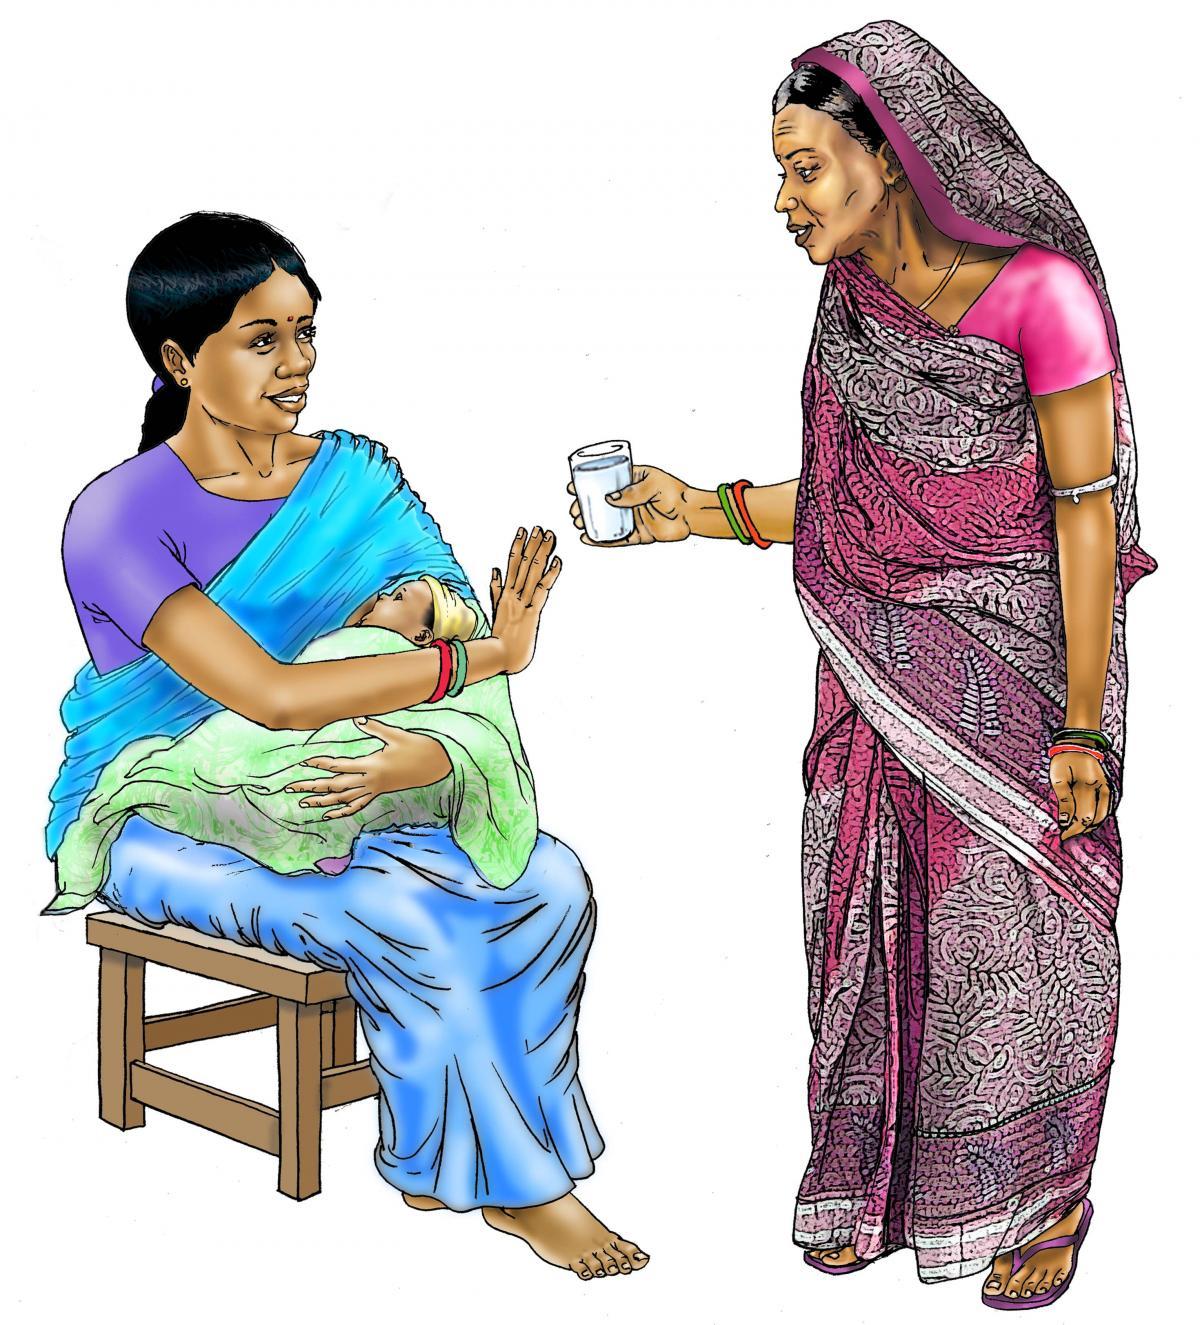 Breastfeeding - No water during breastfeeding 0-6 mo - 01 - India